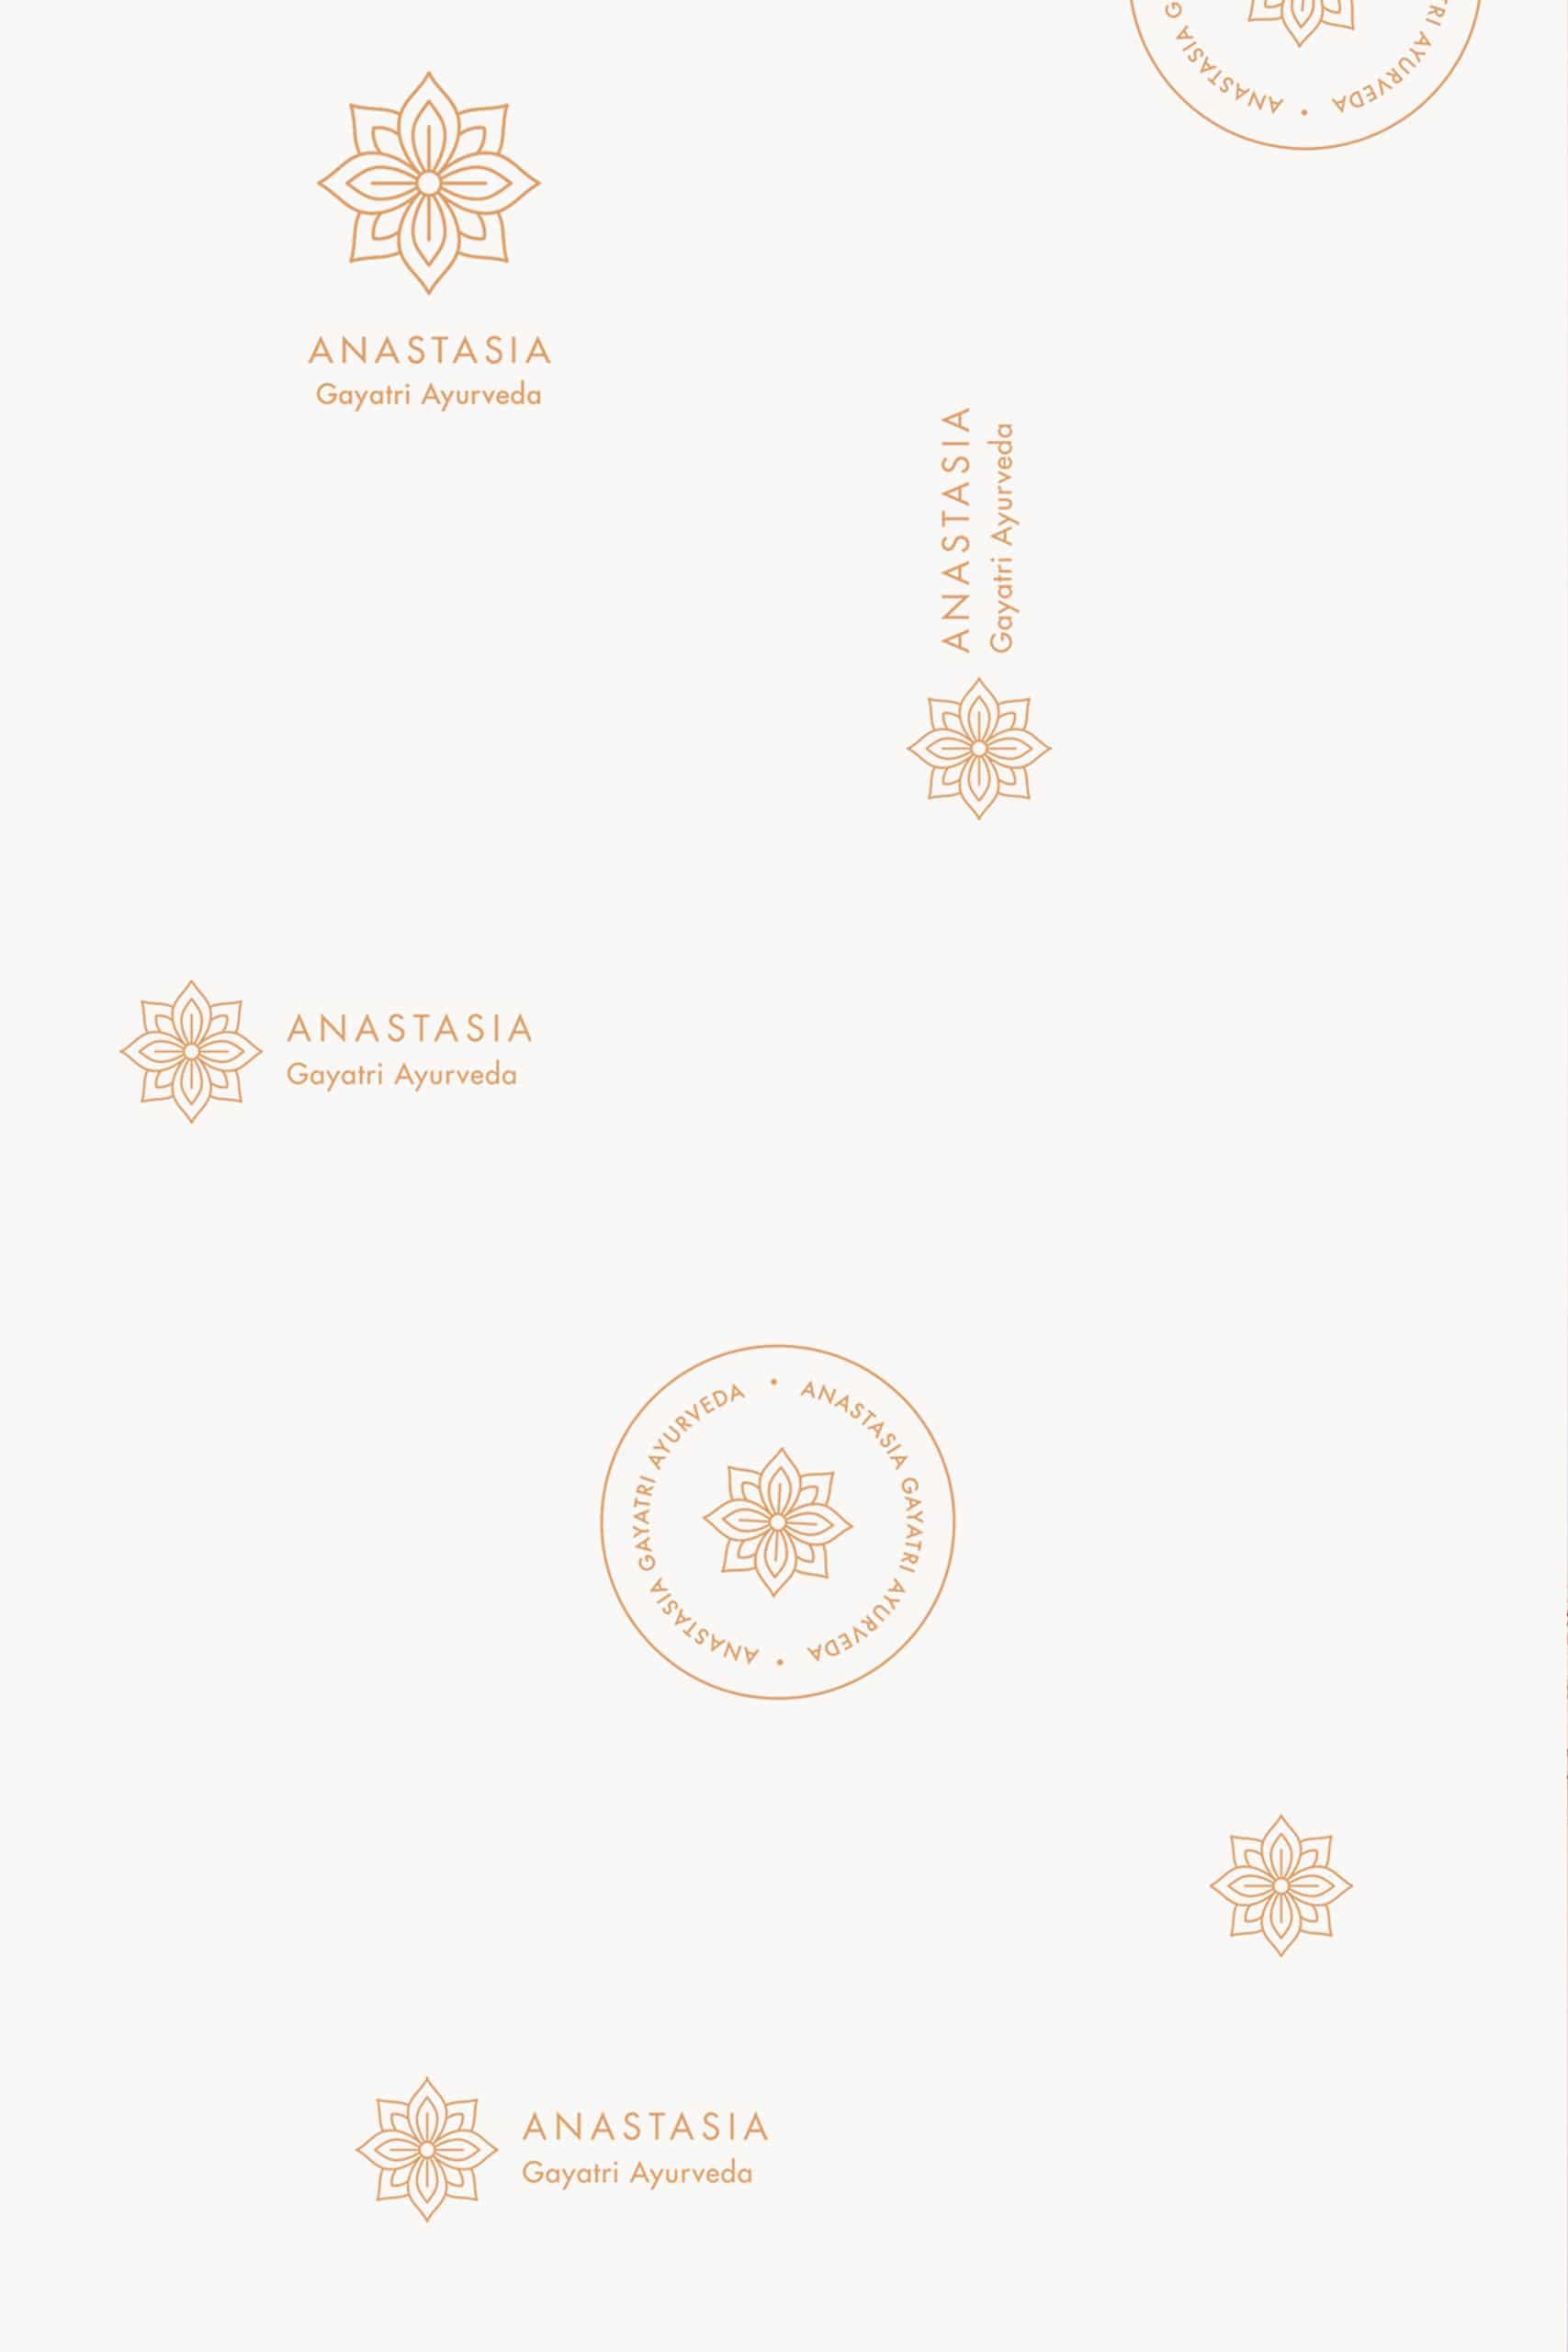 Différents logotypes et déclinaisons pour Anastasia Gayatri Ayurveda